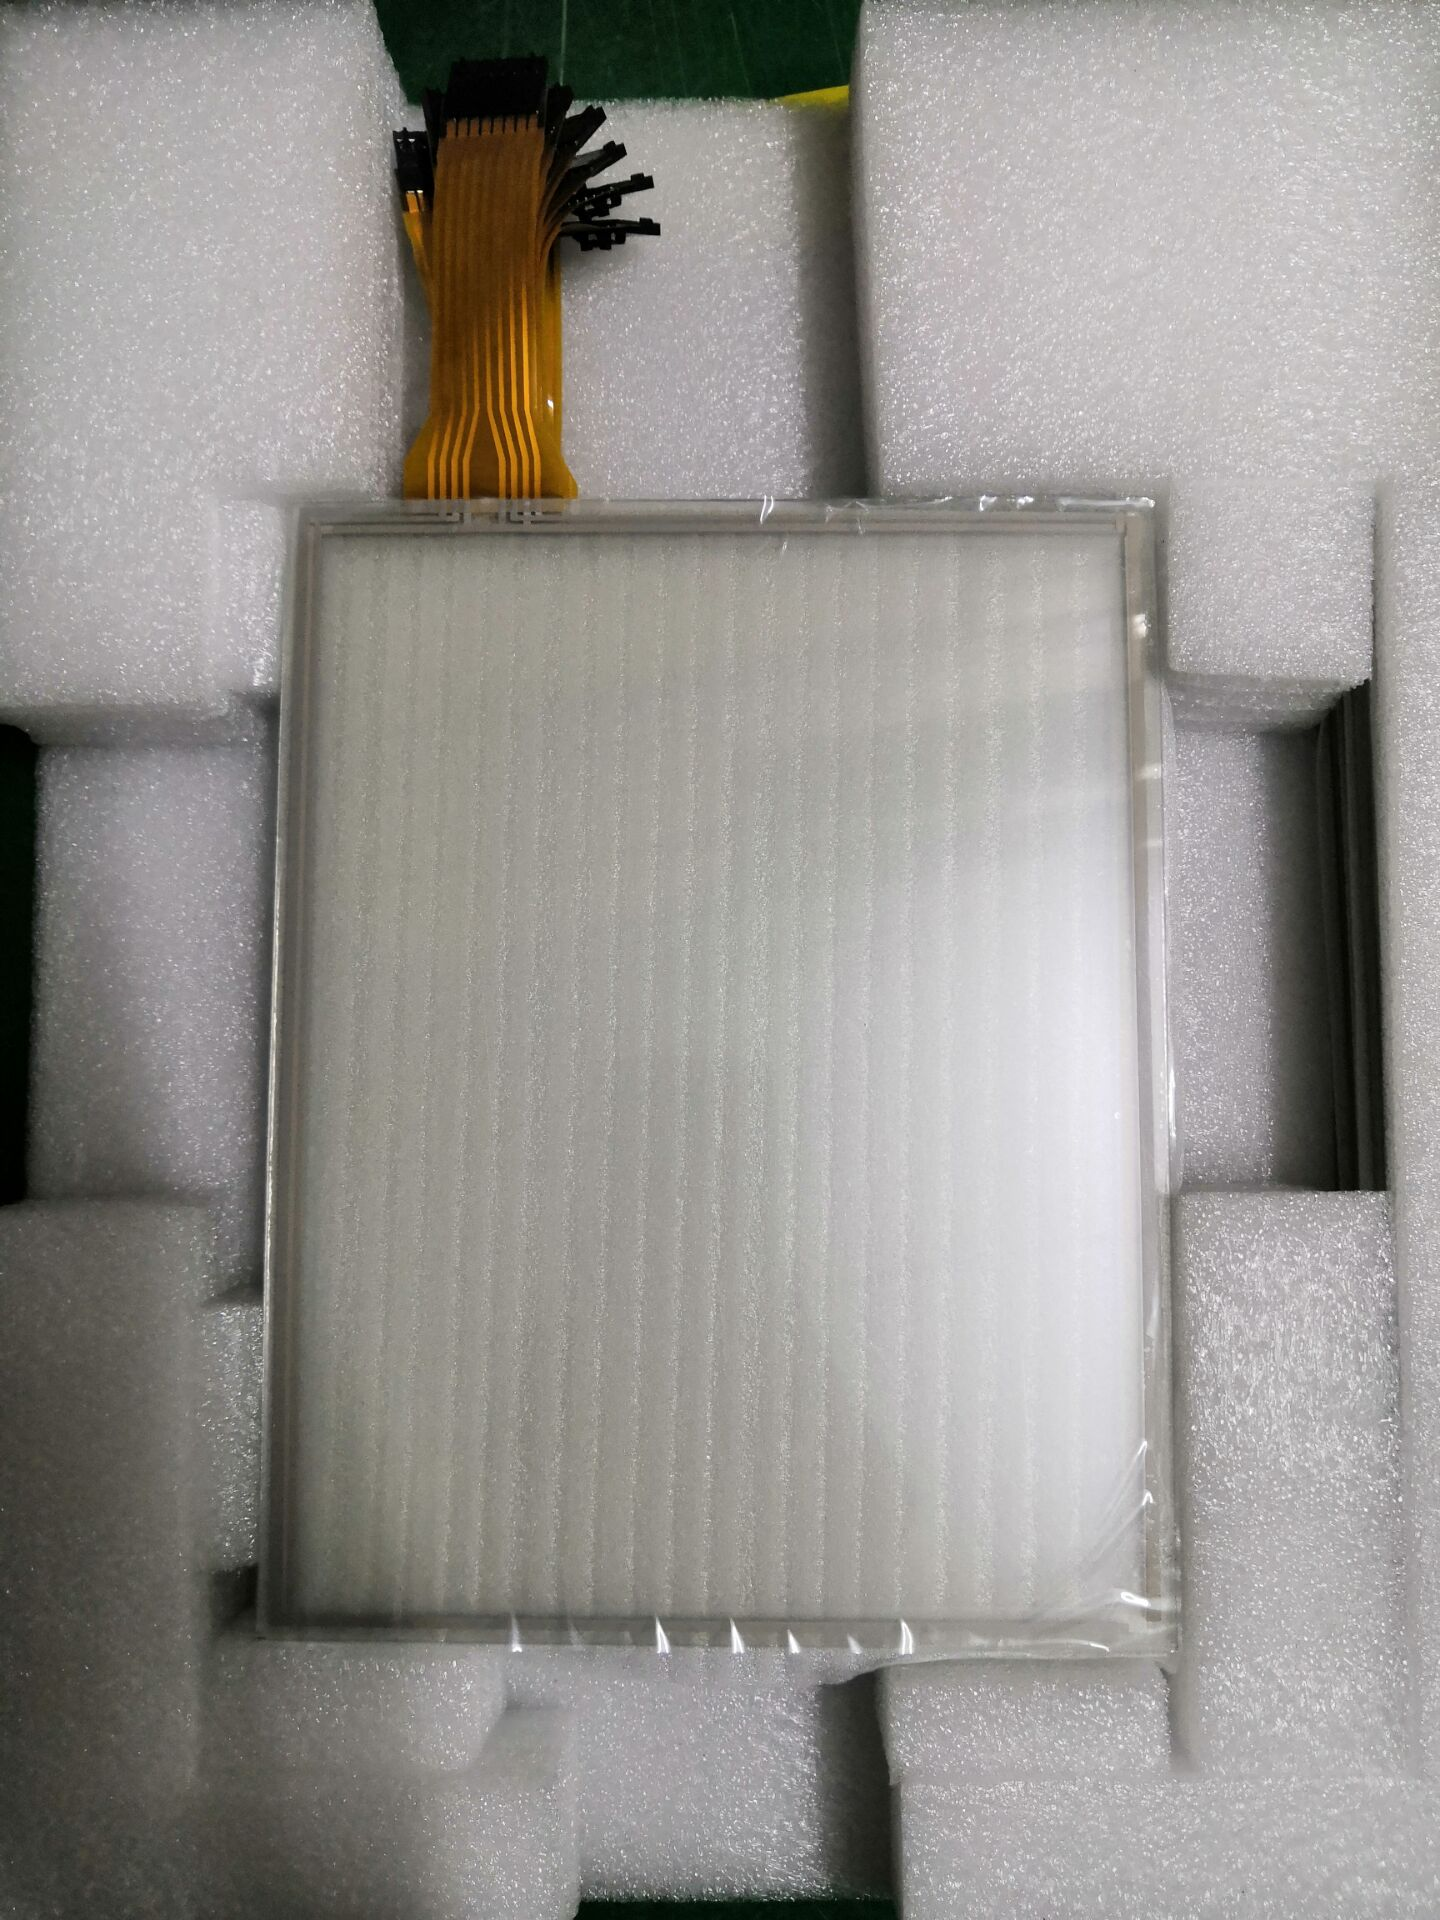 Panel de pantalla táctil resistente, 10,4 pulgadas, 8 cables, mbr8103a1